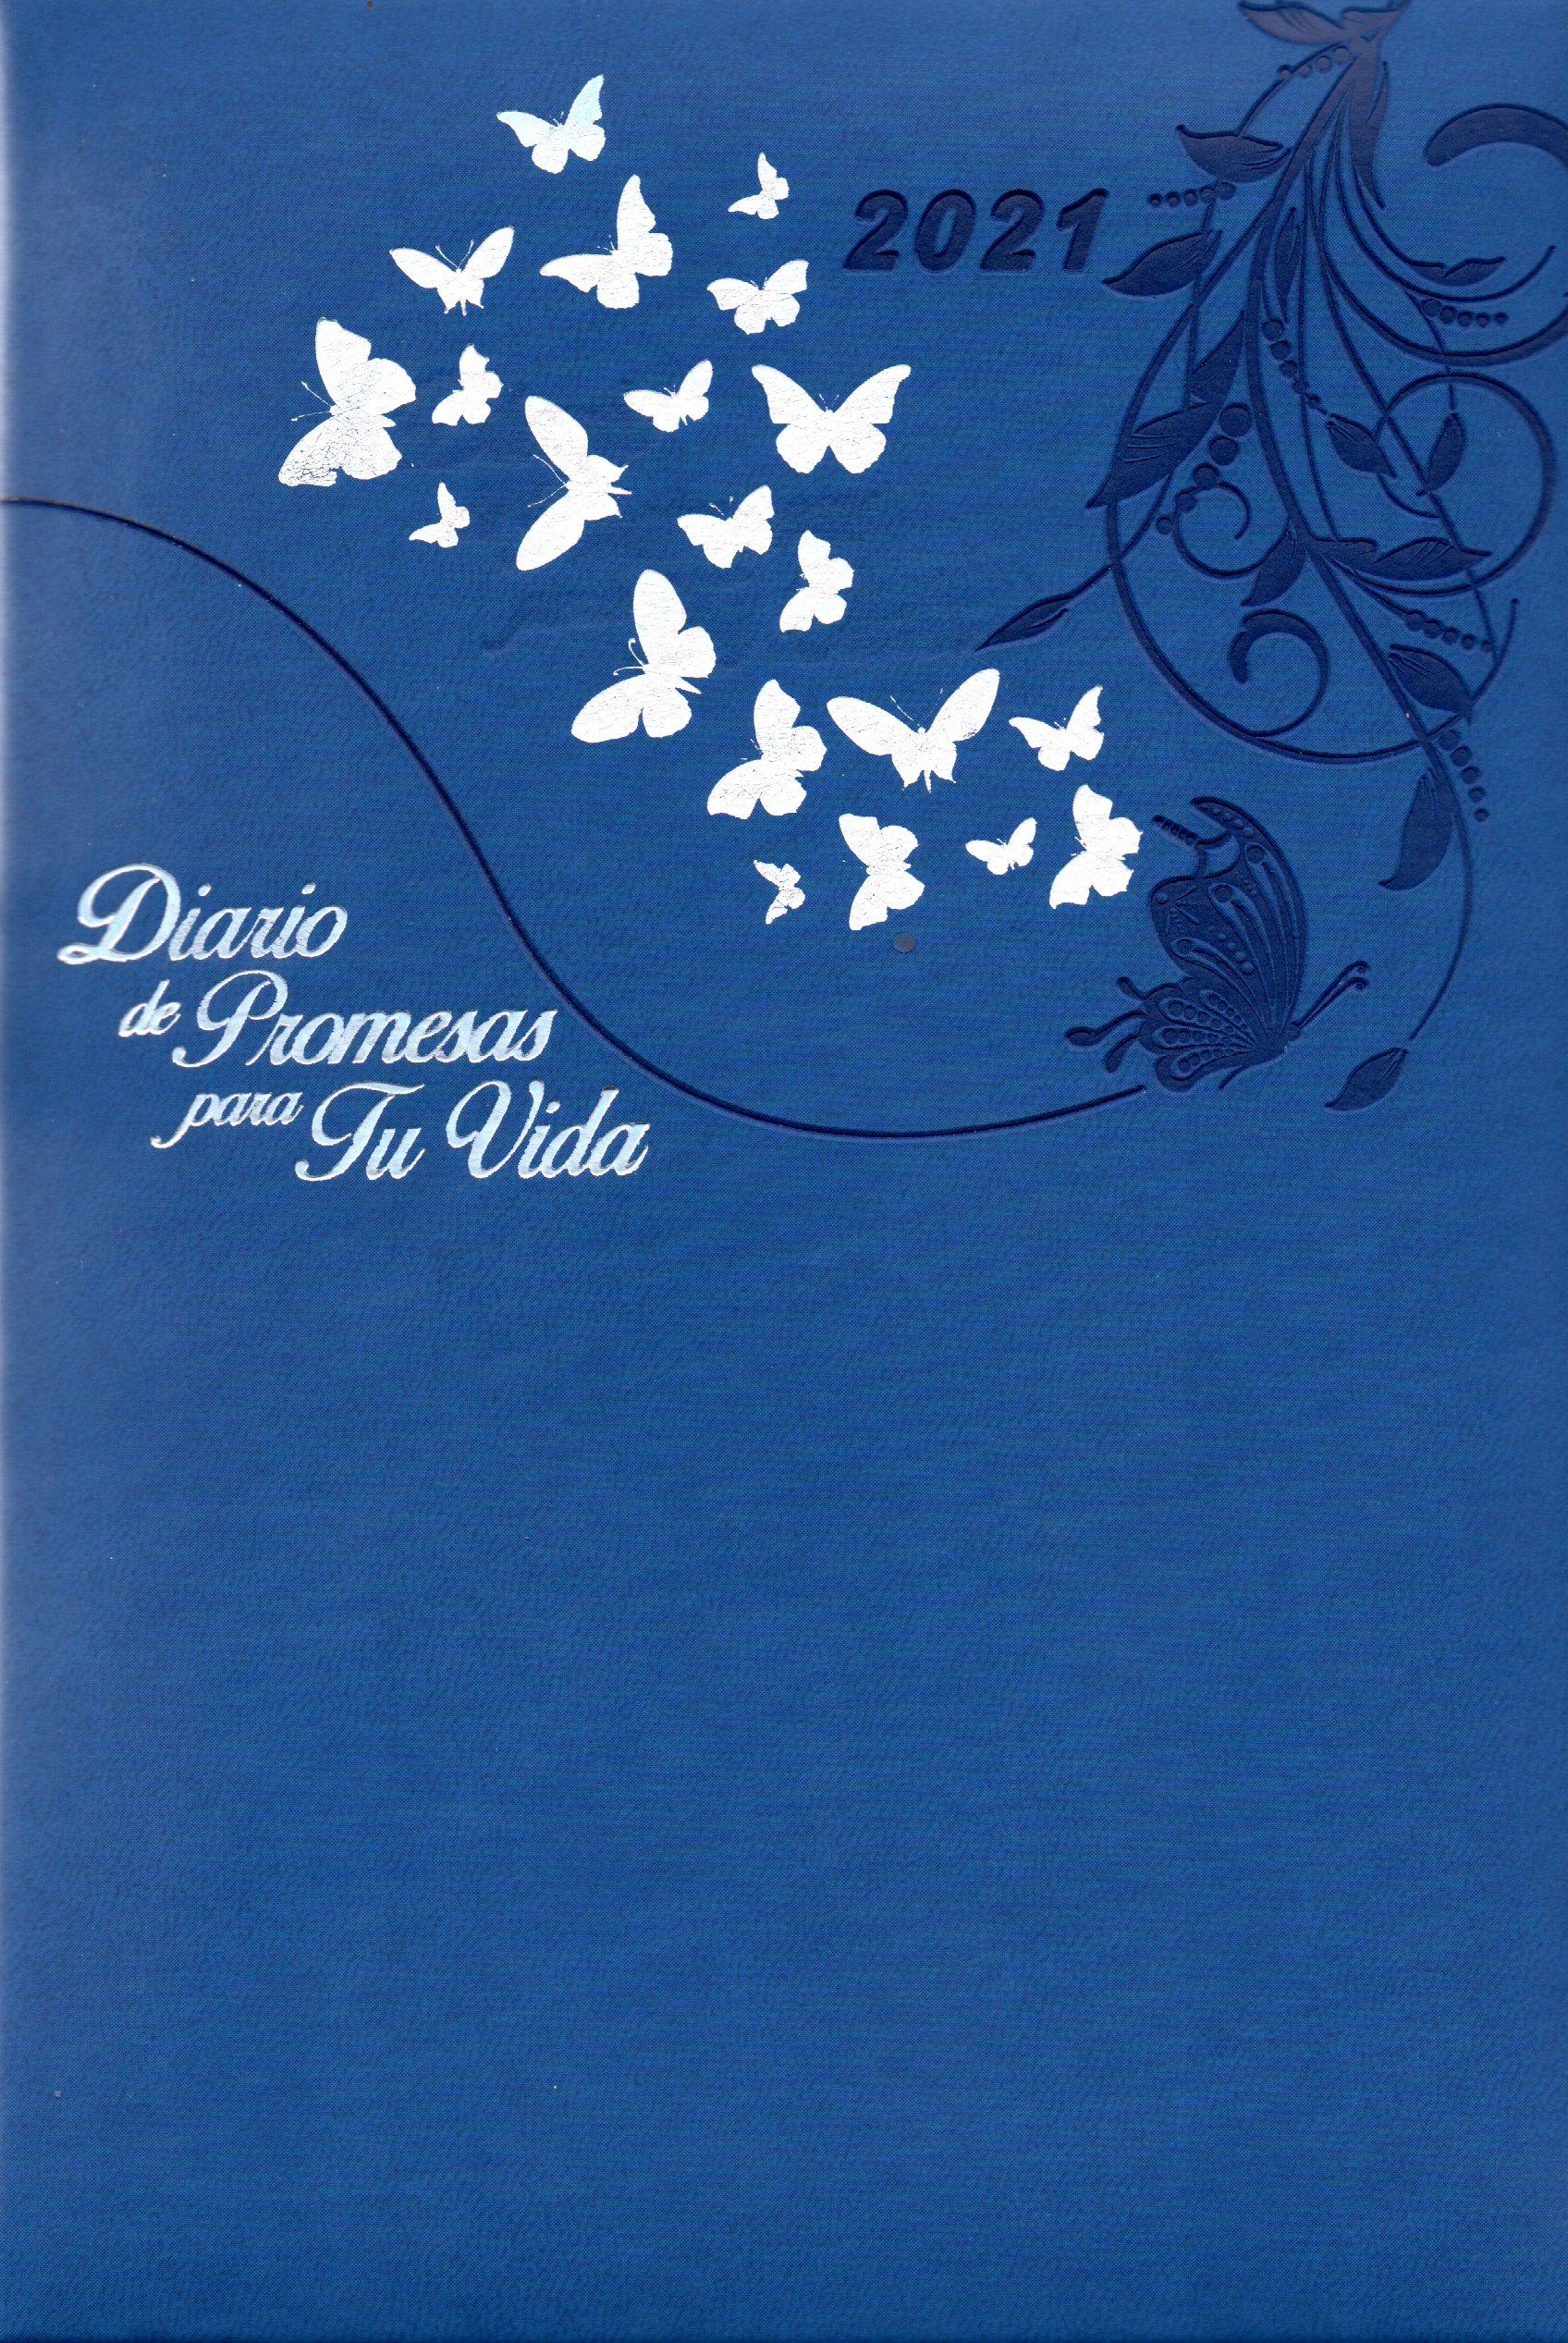 Agenda Diario De Promesas 2021 Mujer Azul Rey